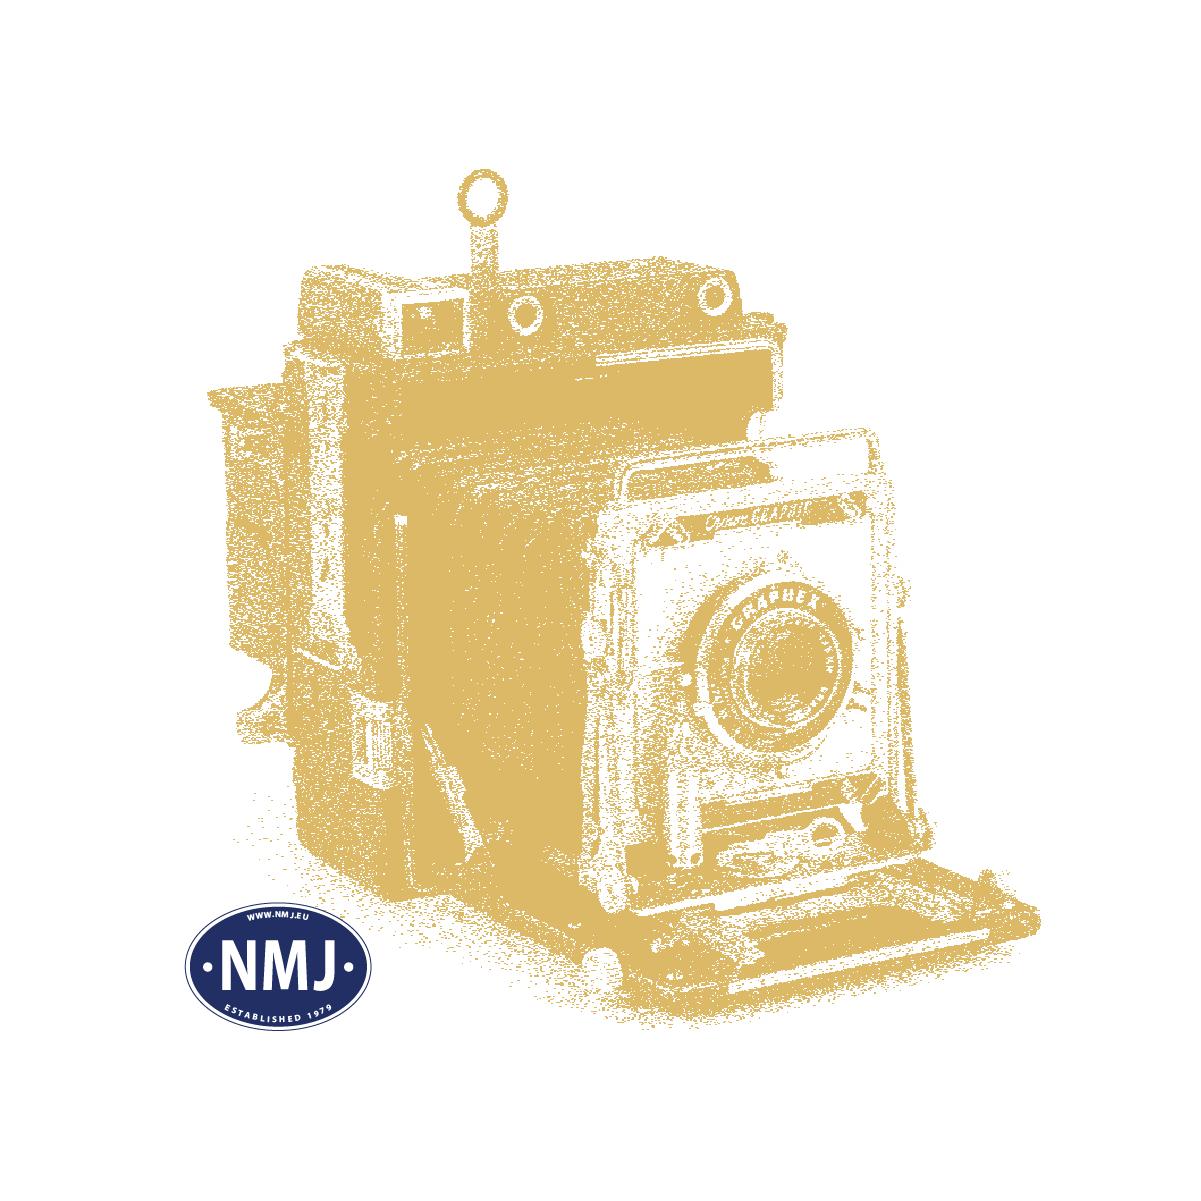 NMJT95302 - NMJ Topline CFL 1603 (1956-1971), AC m/ Sound